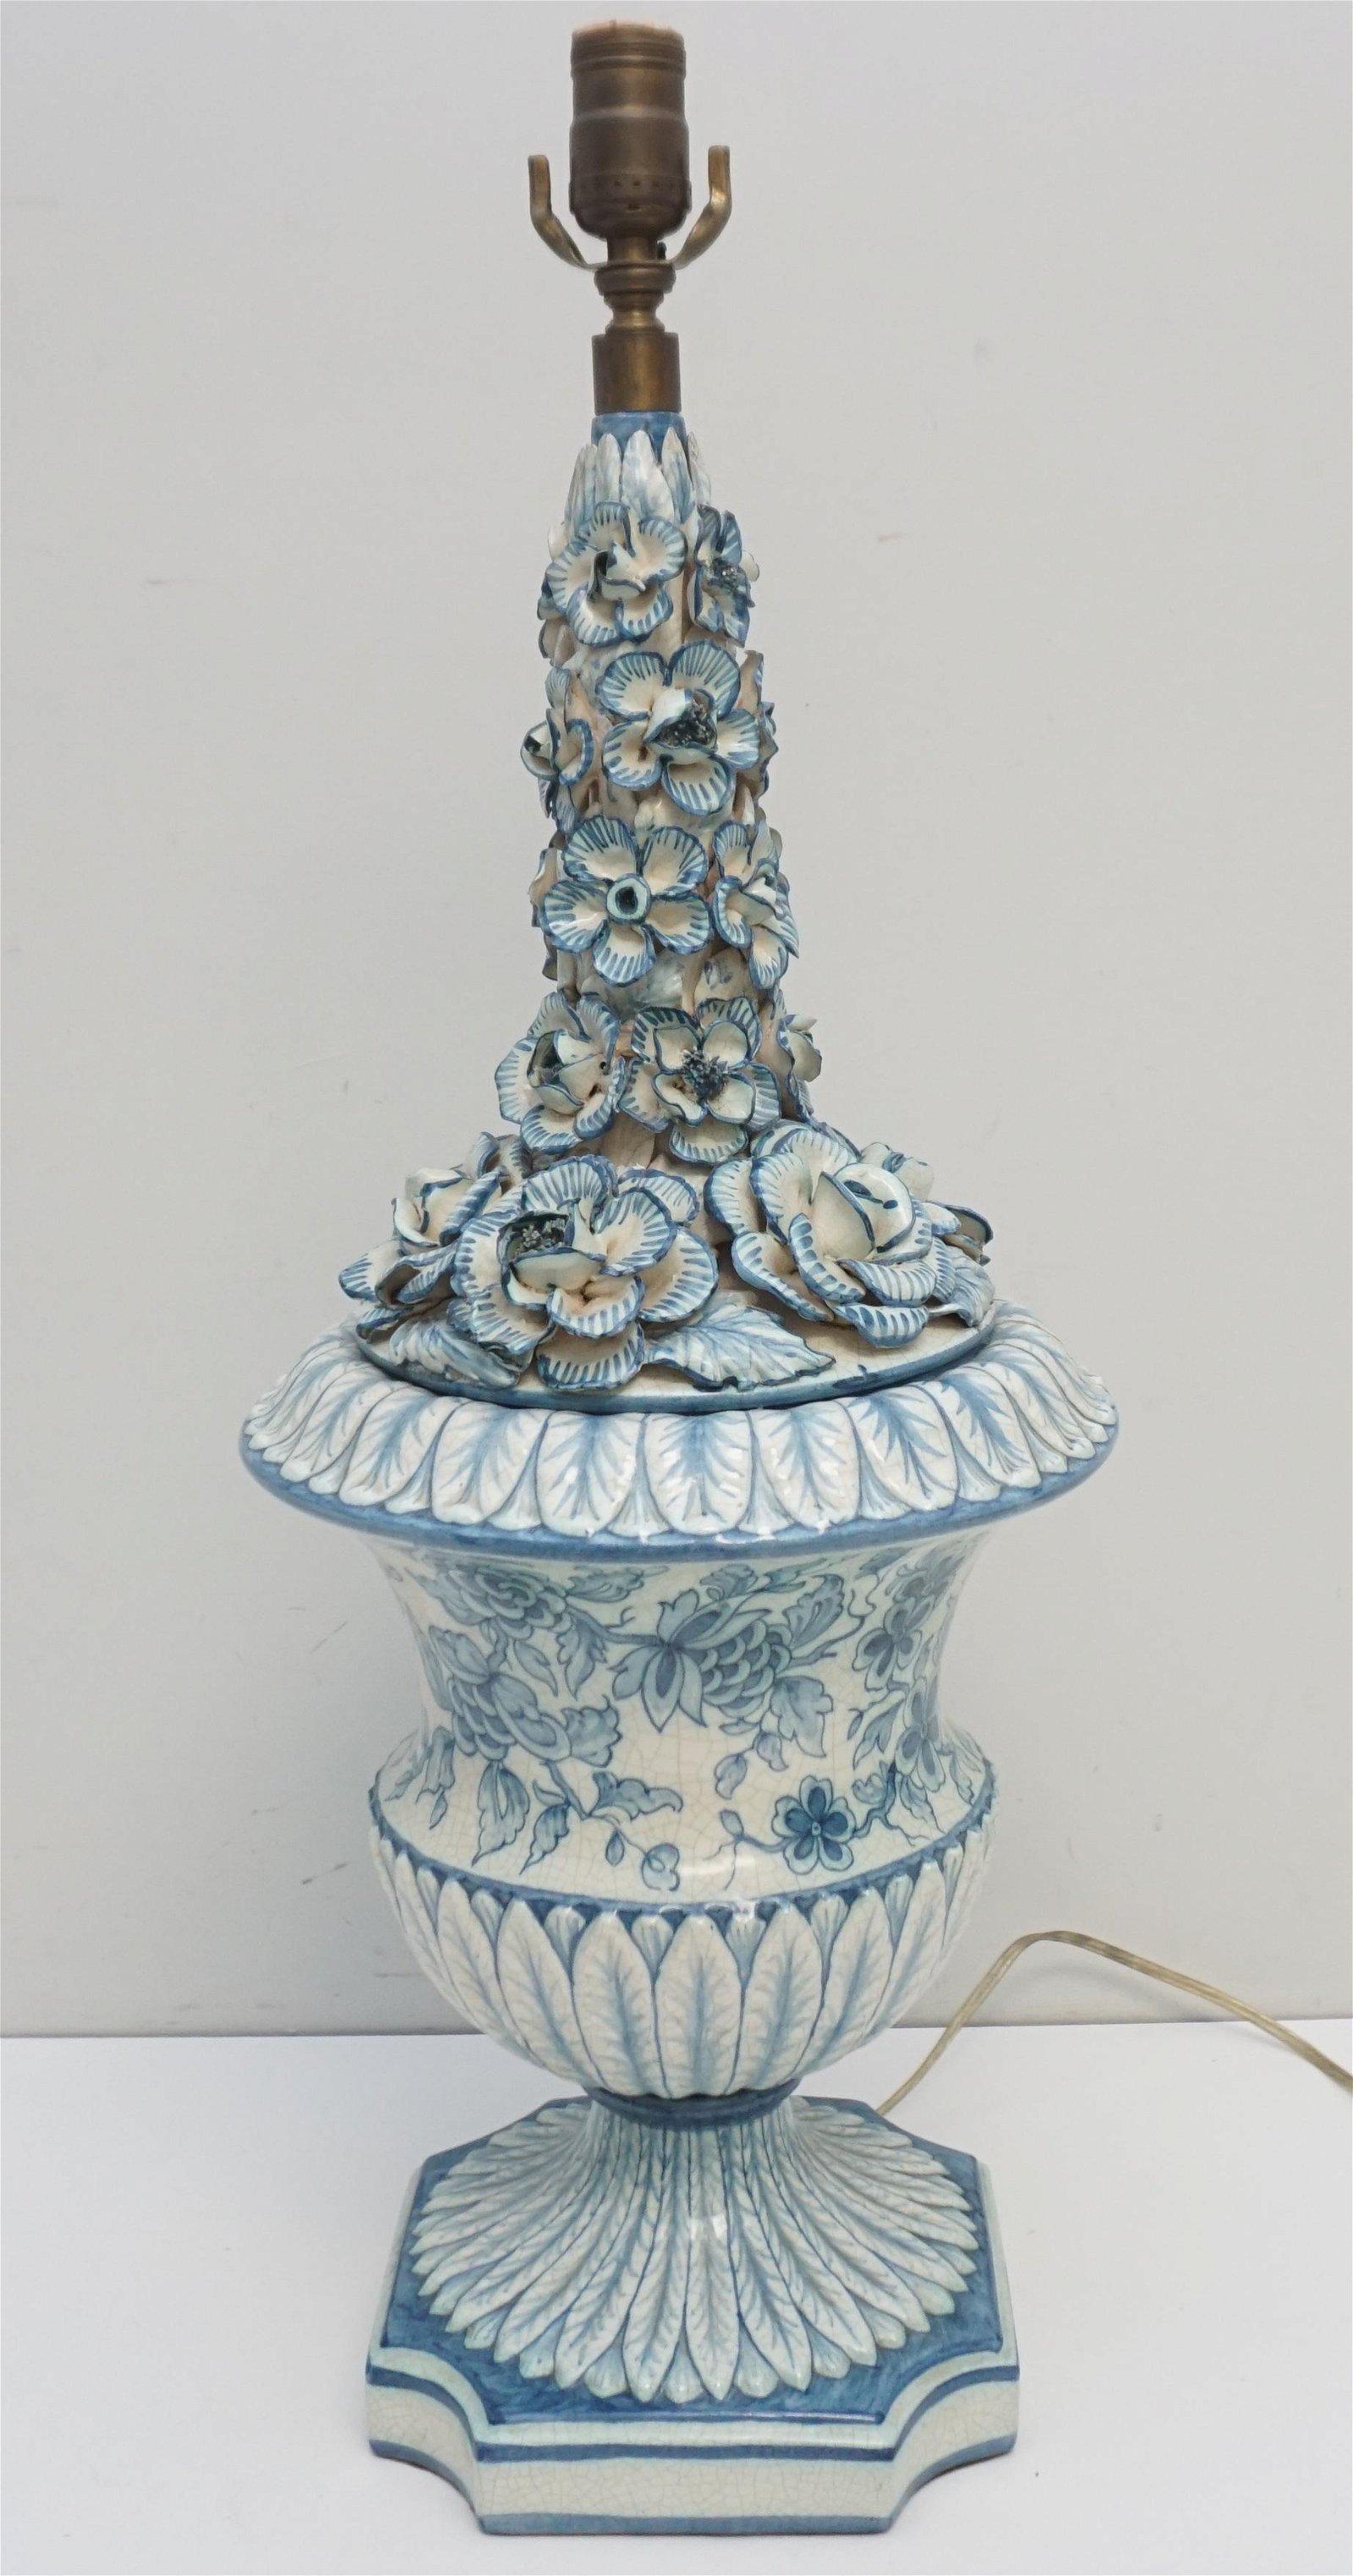 MANISES MID CENTURY SPANISH TABLE LAMP